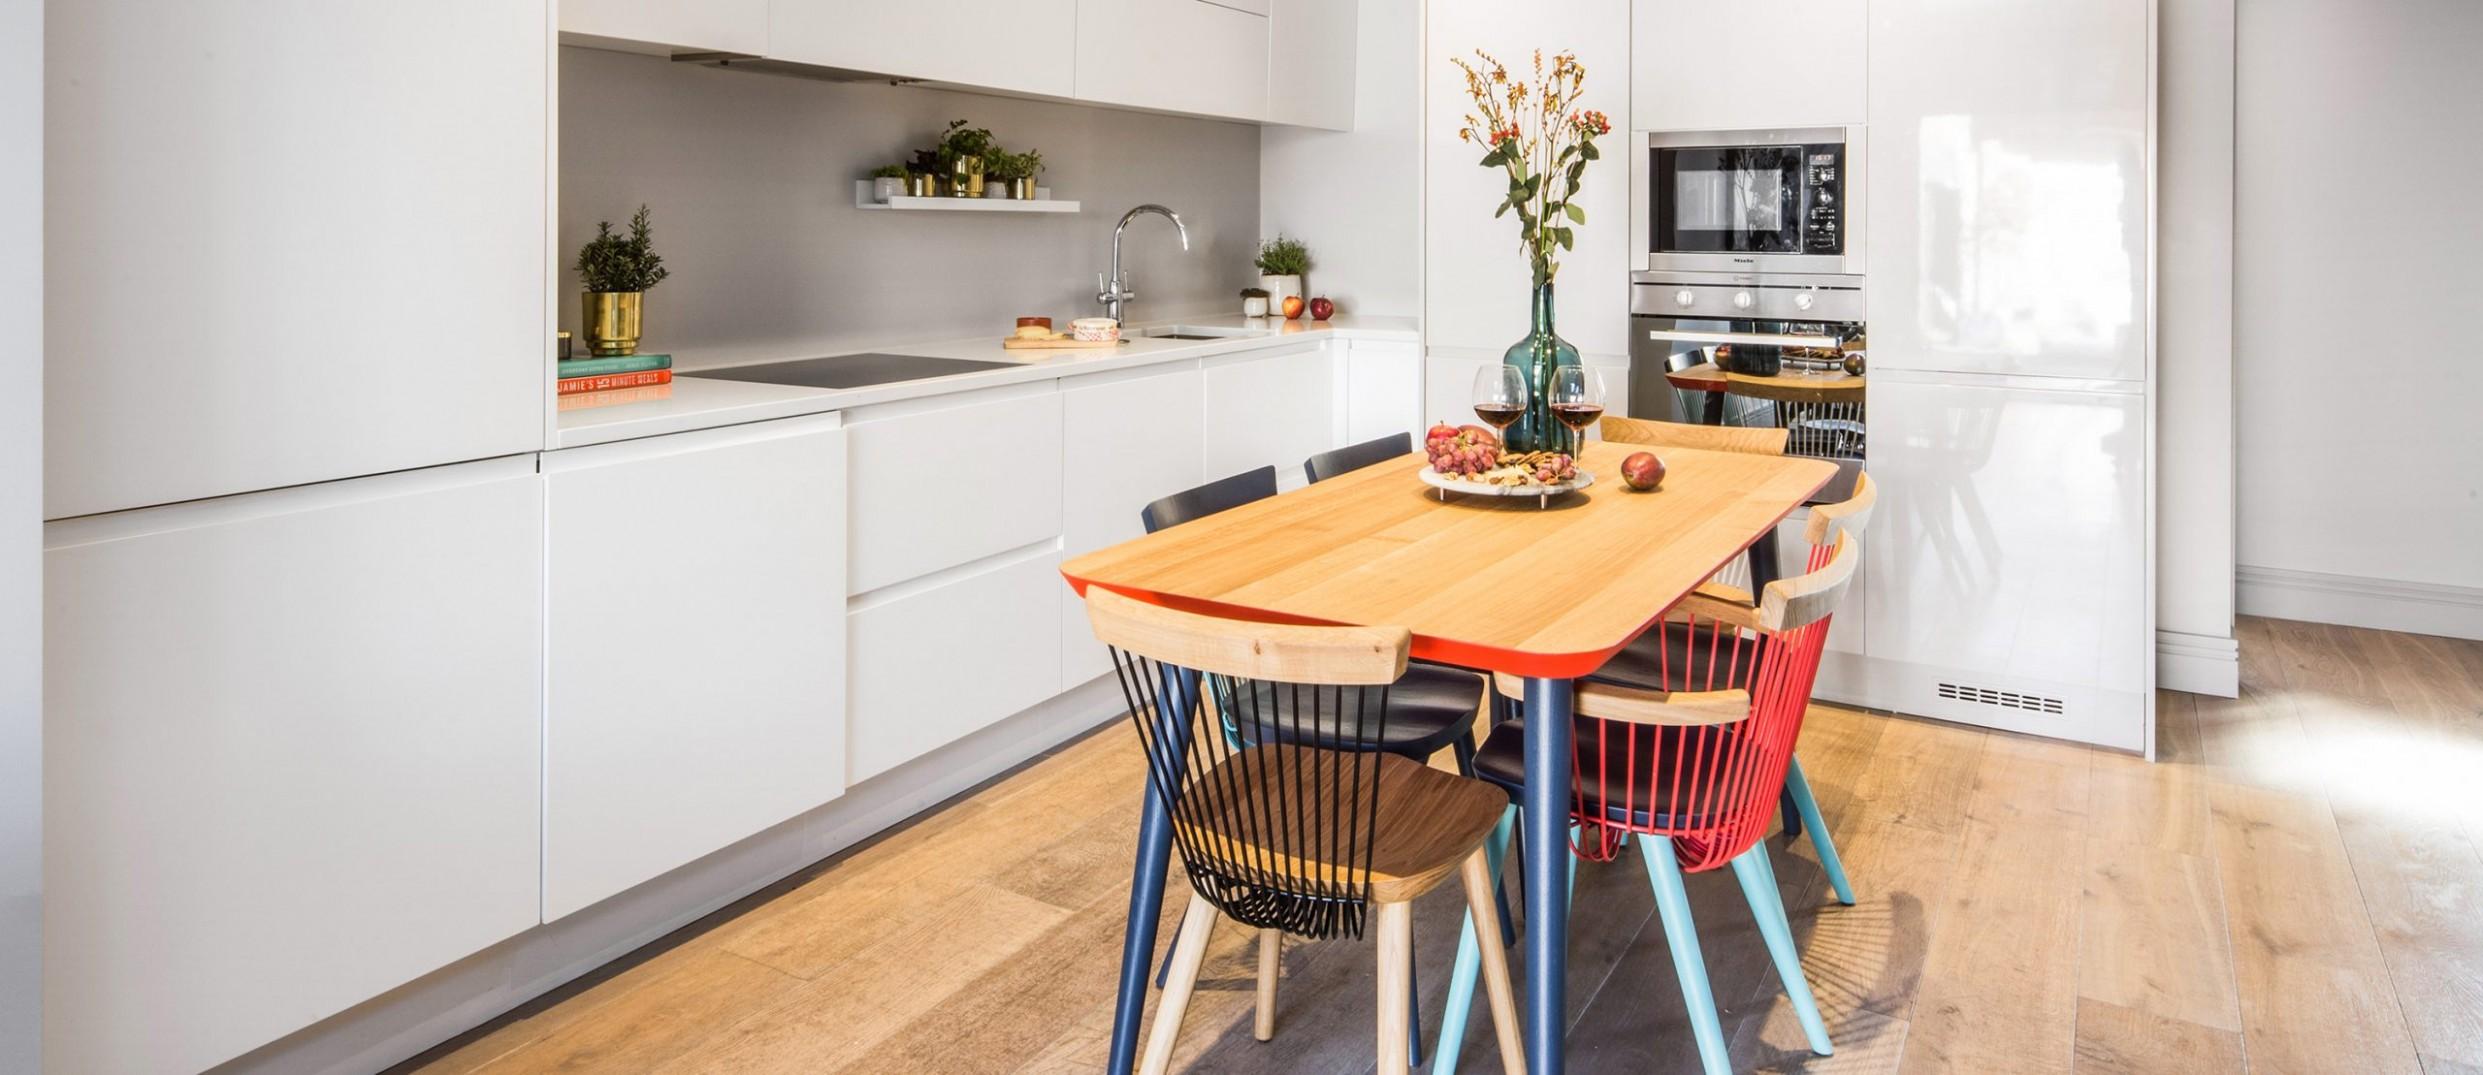 A TEMZA LONDON APARTMENT INTERIOR DESIGN GUIDE - Apartment Design Guide Uk